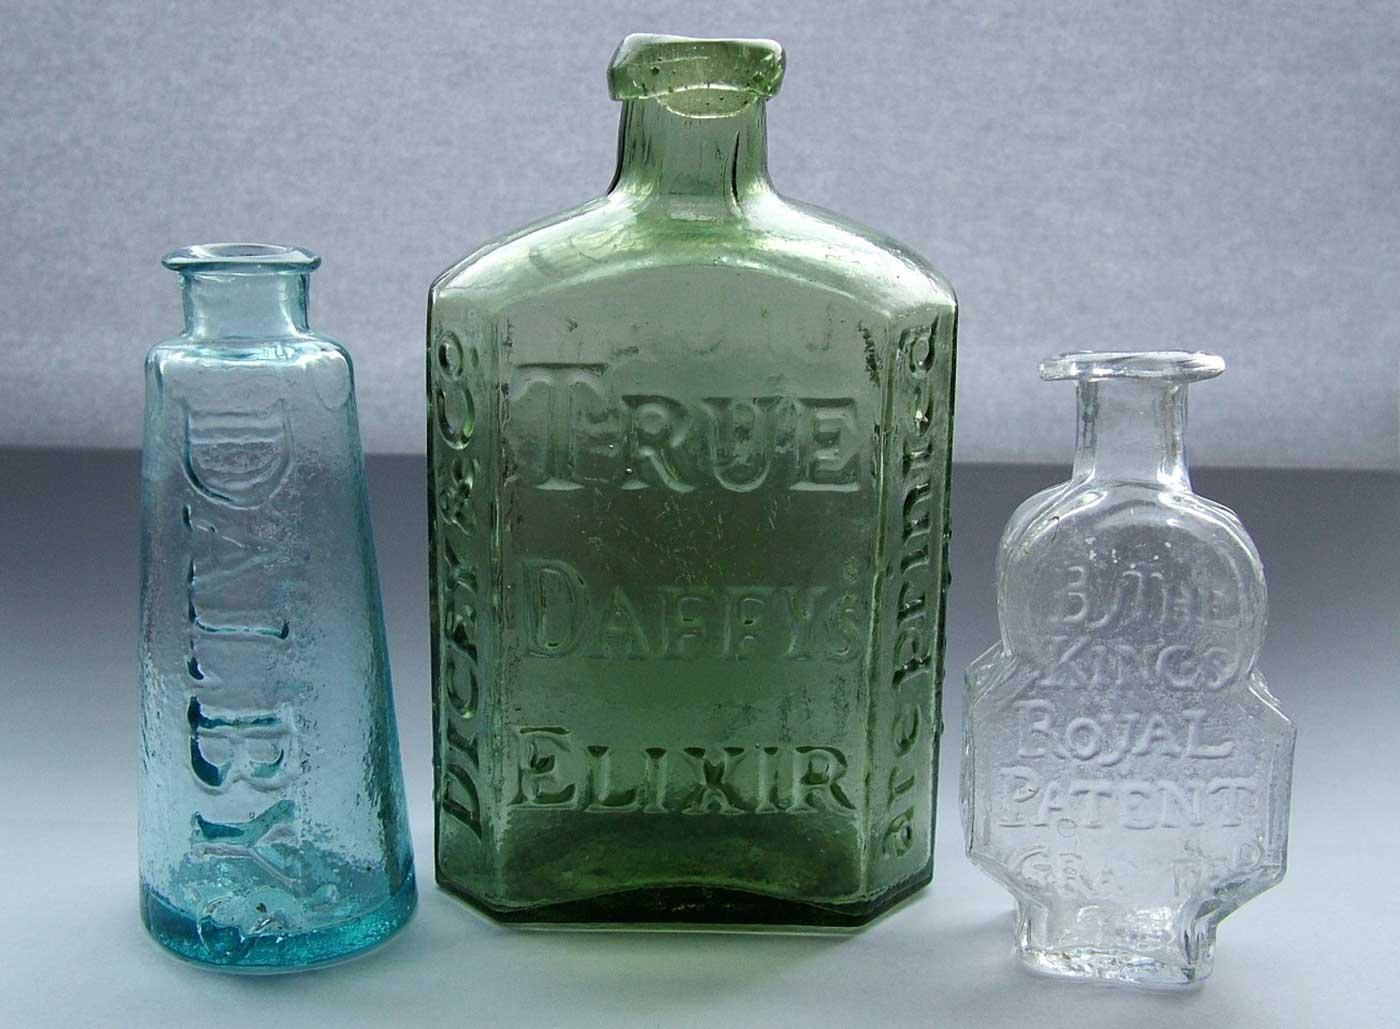 Three antique medicine bottles.